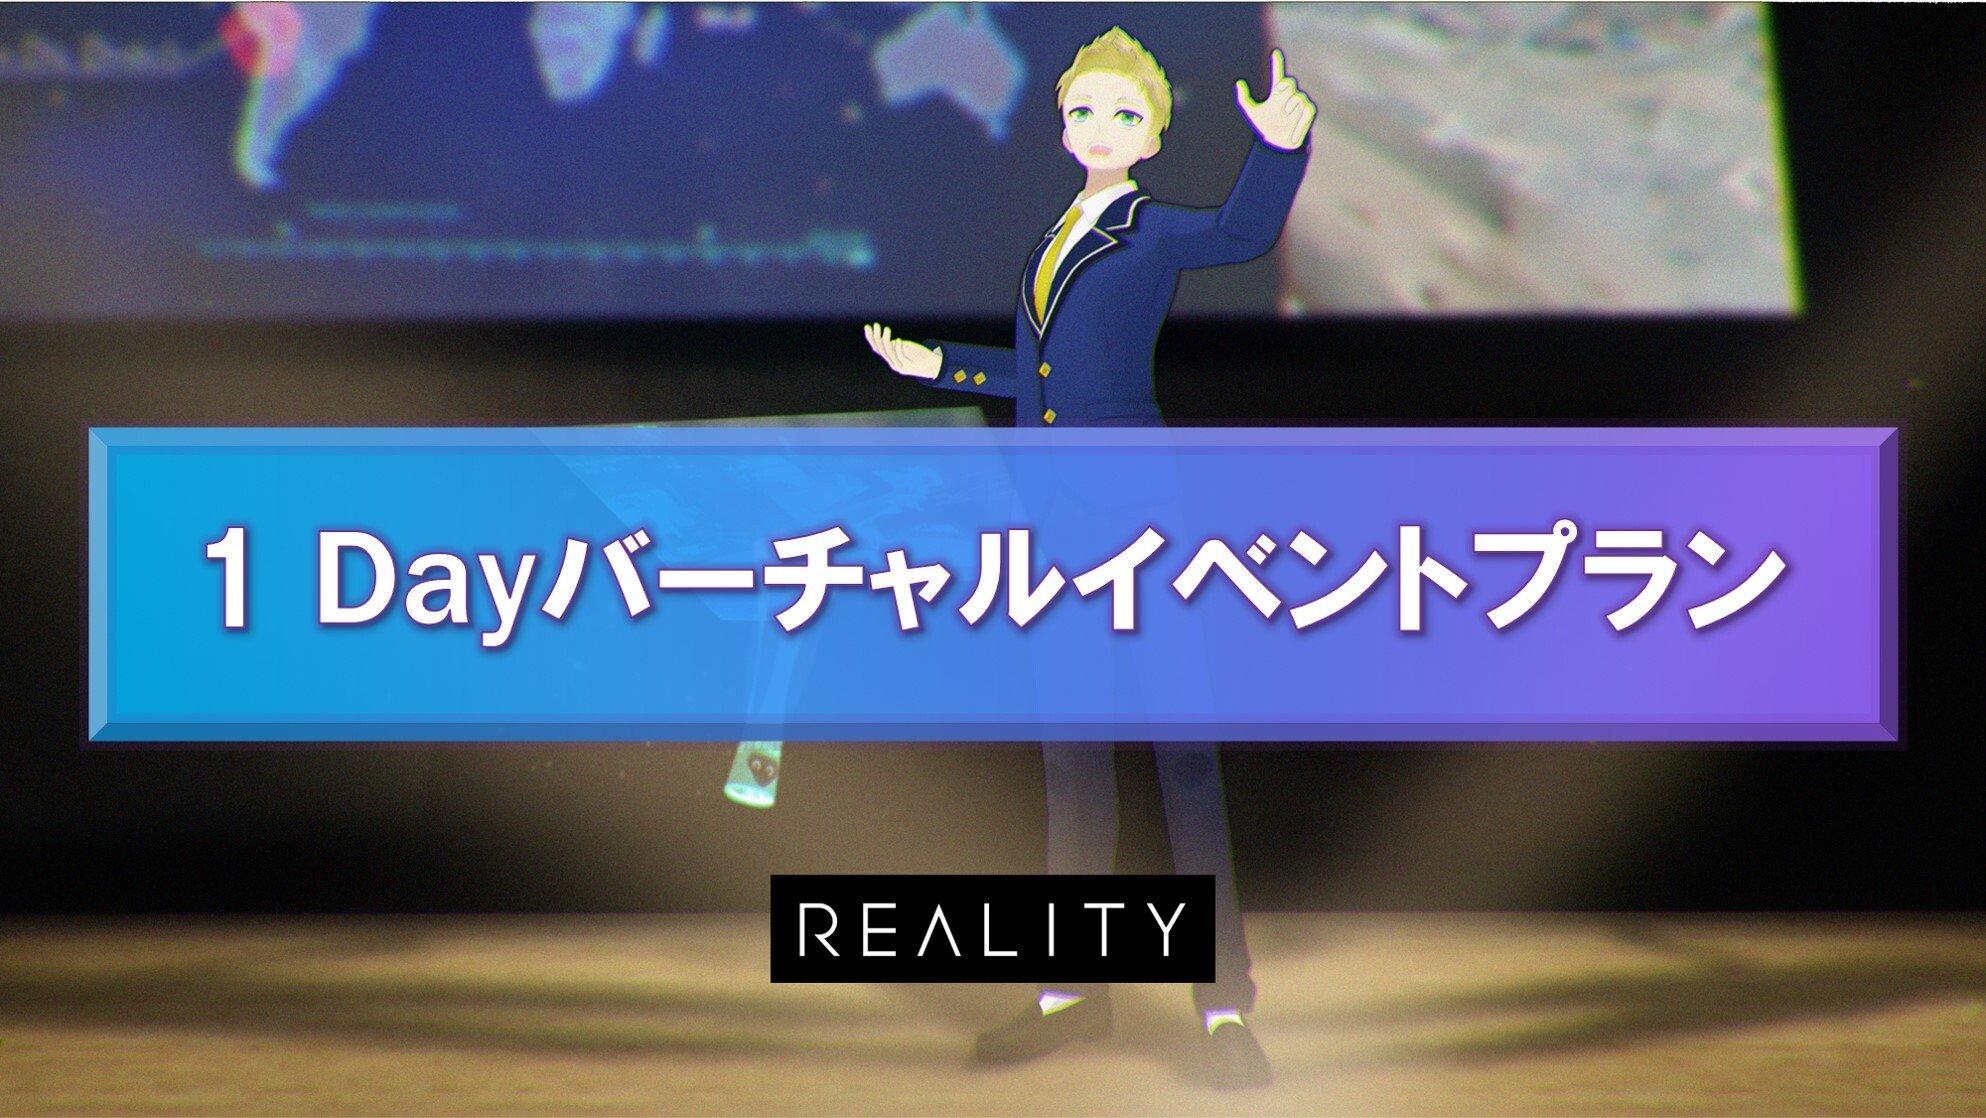 XRキービジュアル.jpg